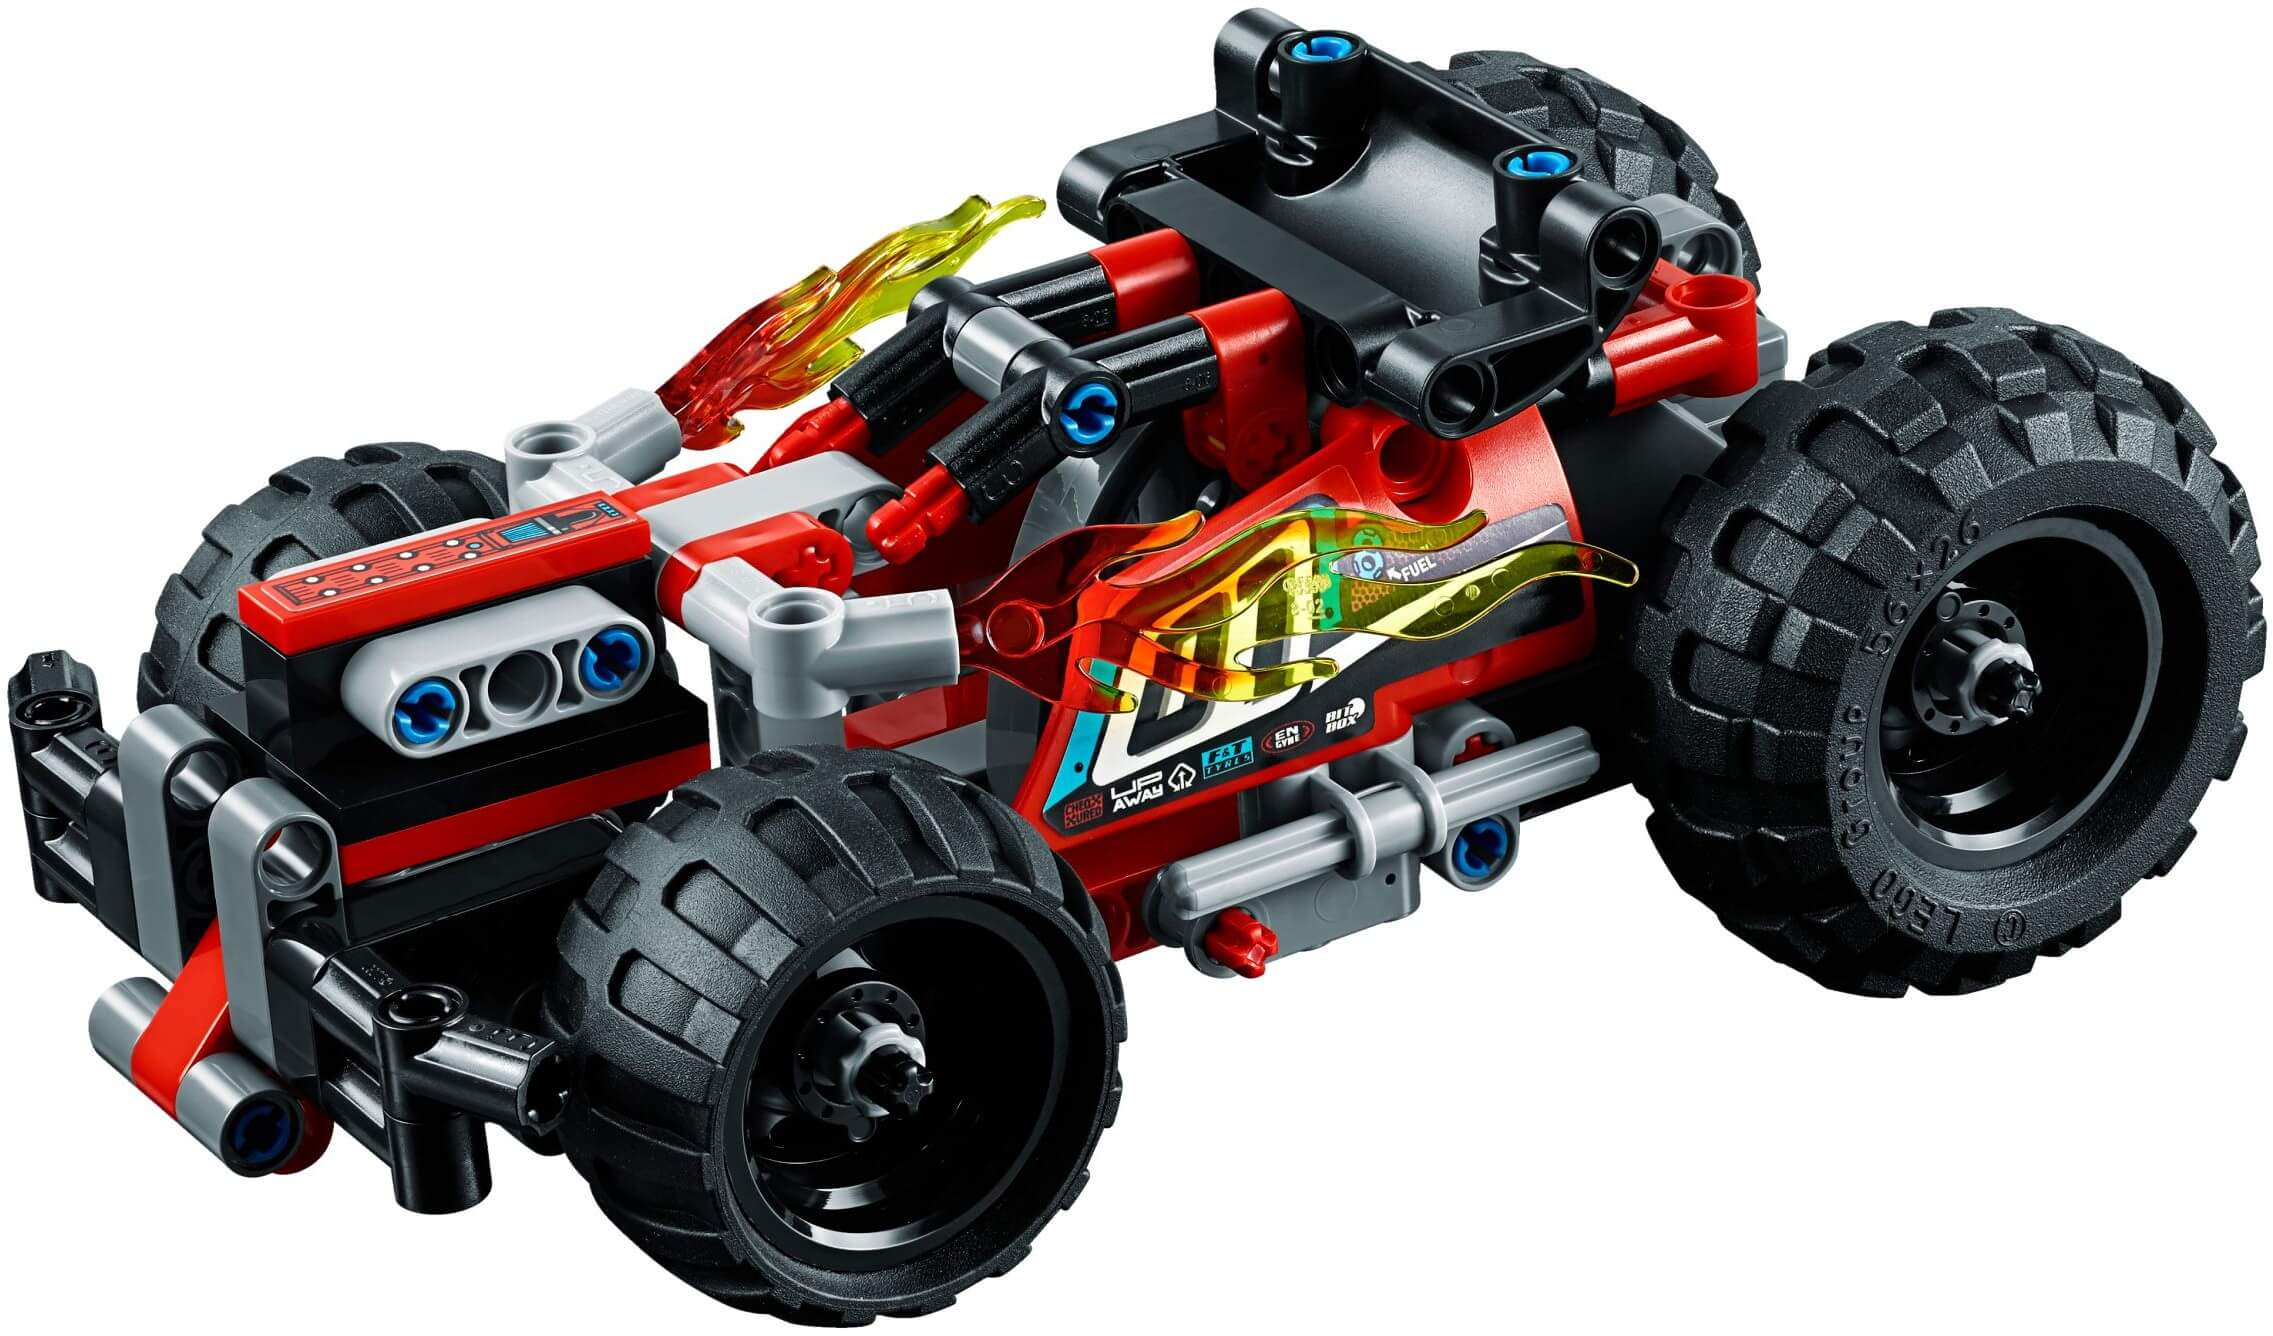 Mua đồ chơi LEGO 42073 - LEGO Technic 42073 - Siêu Xe BASH! (LEGO Technic 42073 BASH!)